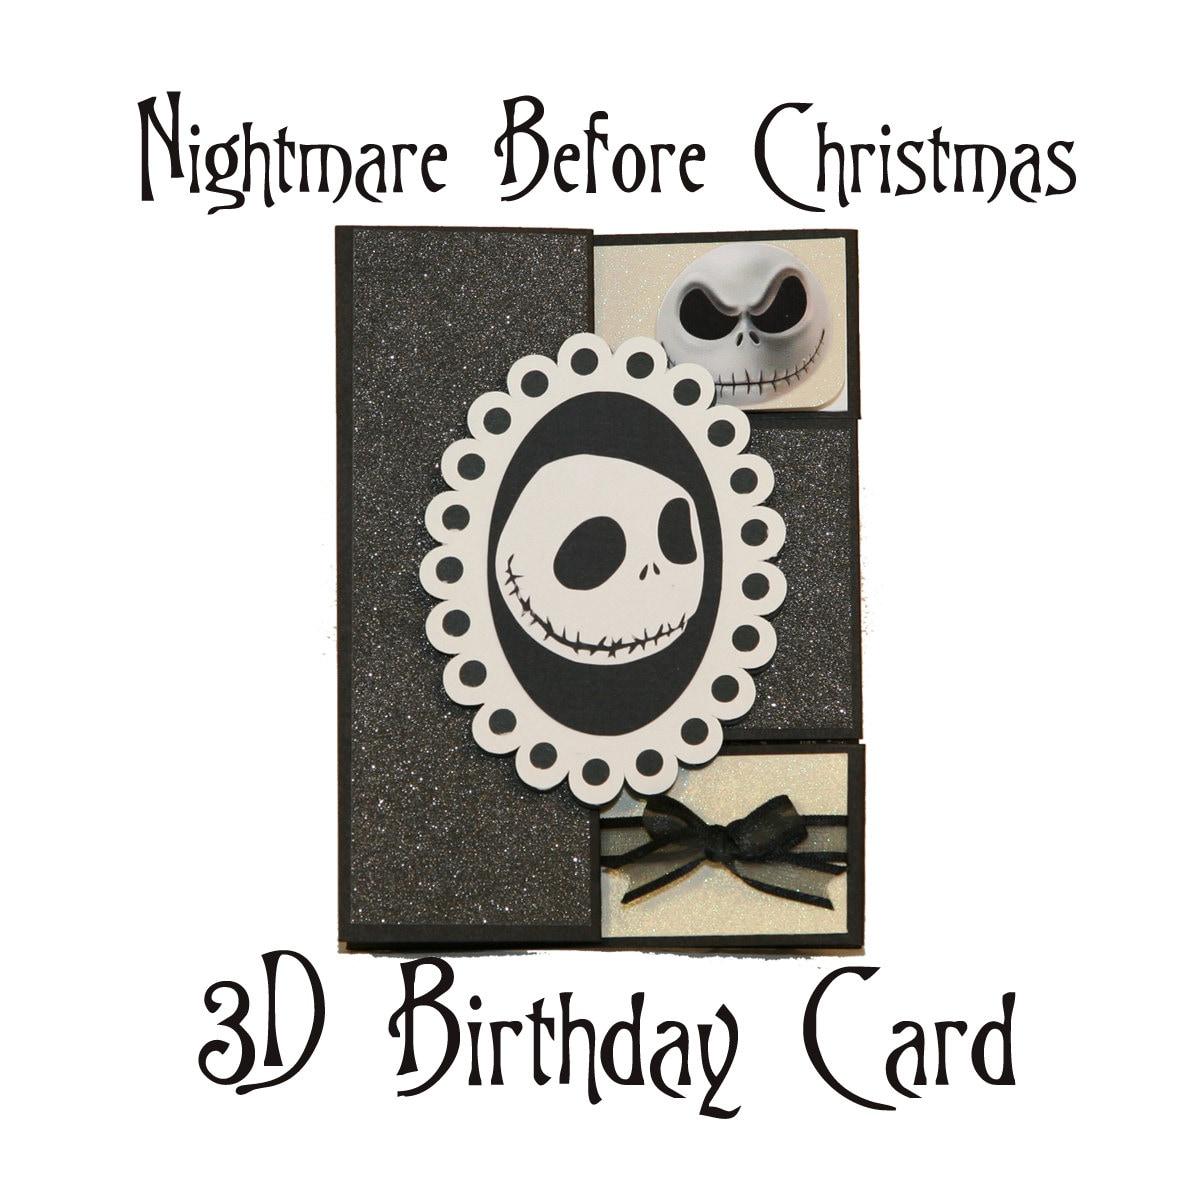 Sensational Nightmare Before Christmas Birthday Shutter By Funny Birthday Cards Online Ioscodamsfinfo